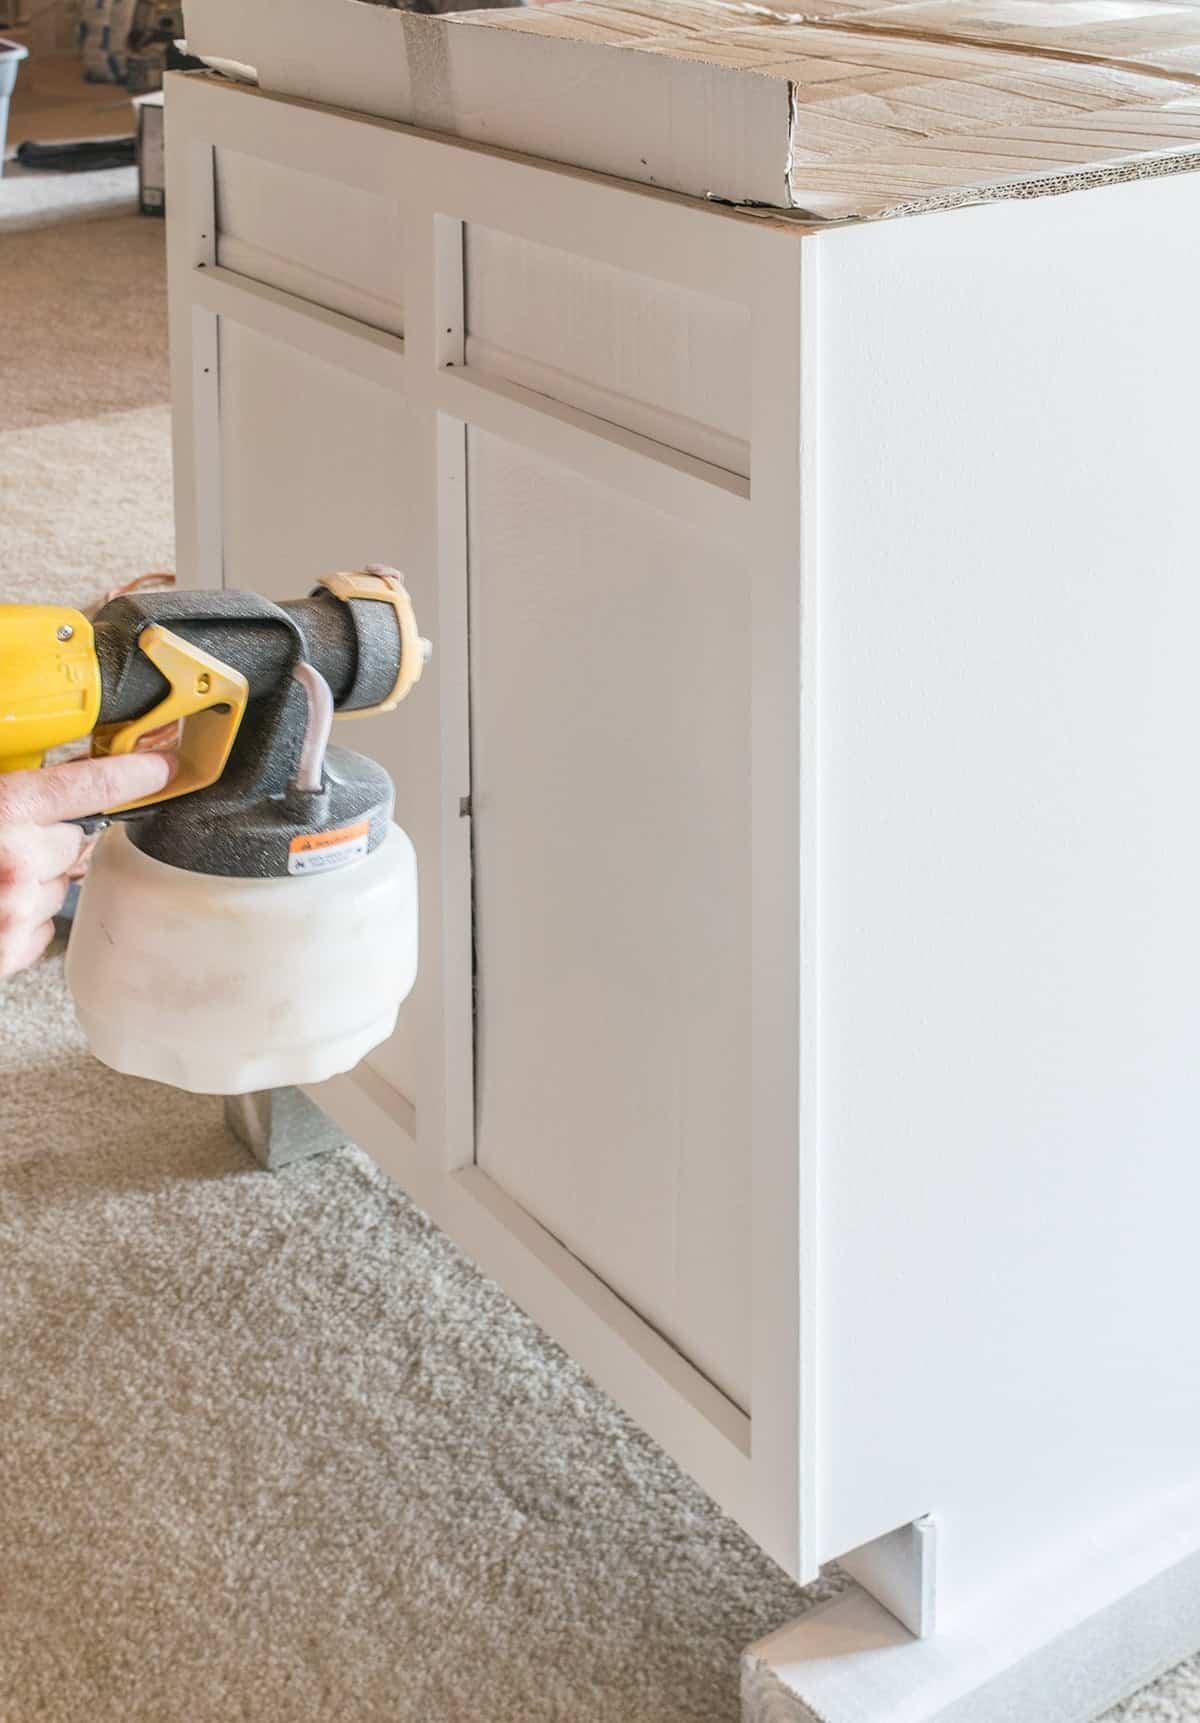 Paint spraying gun applying white matte finish paint to cabinet section.